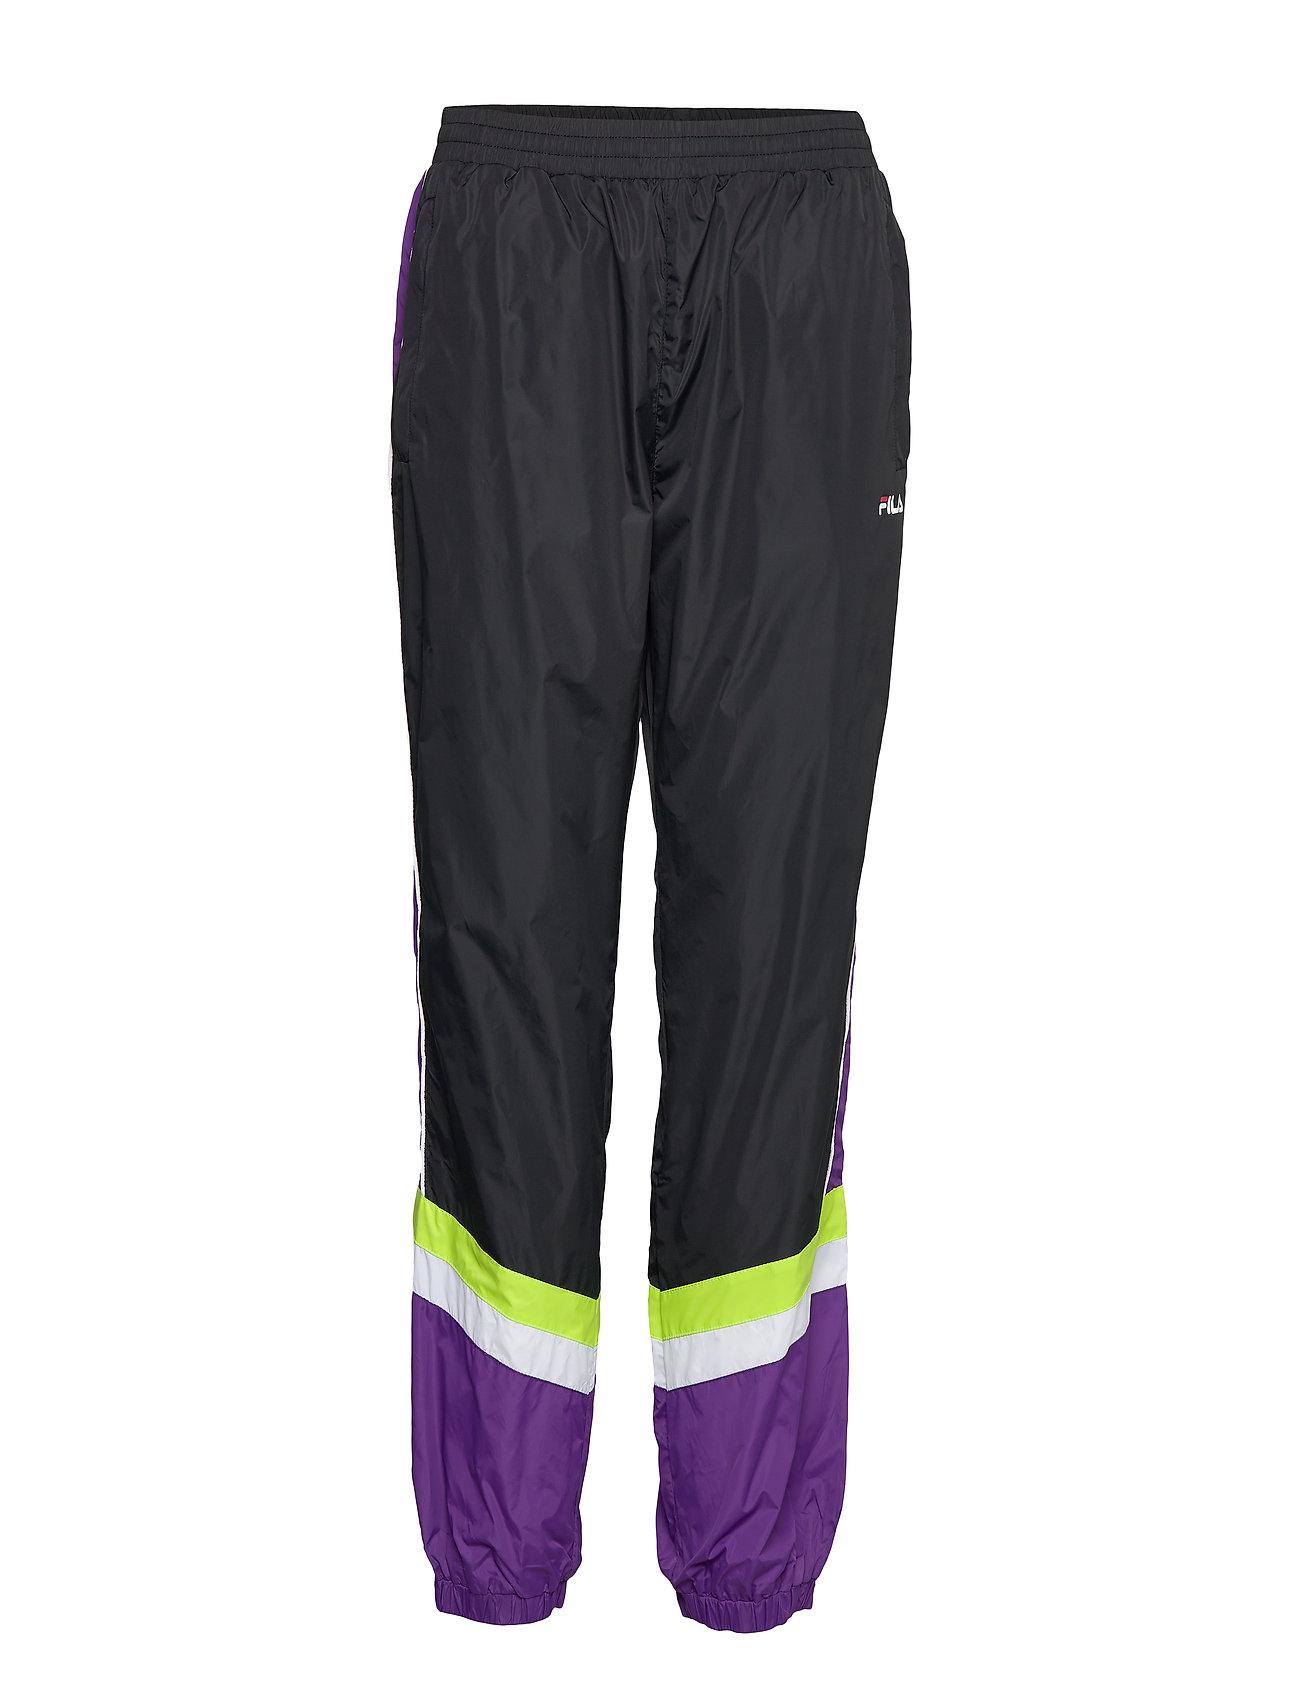 FILA WOMEN RANSIM wind pants - A241 - BLACK-TILLANDSIA PURPLE-BRIGHT WHITE-ACID LIME